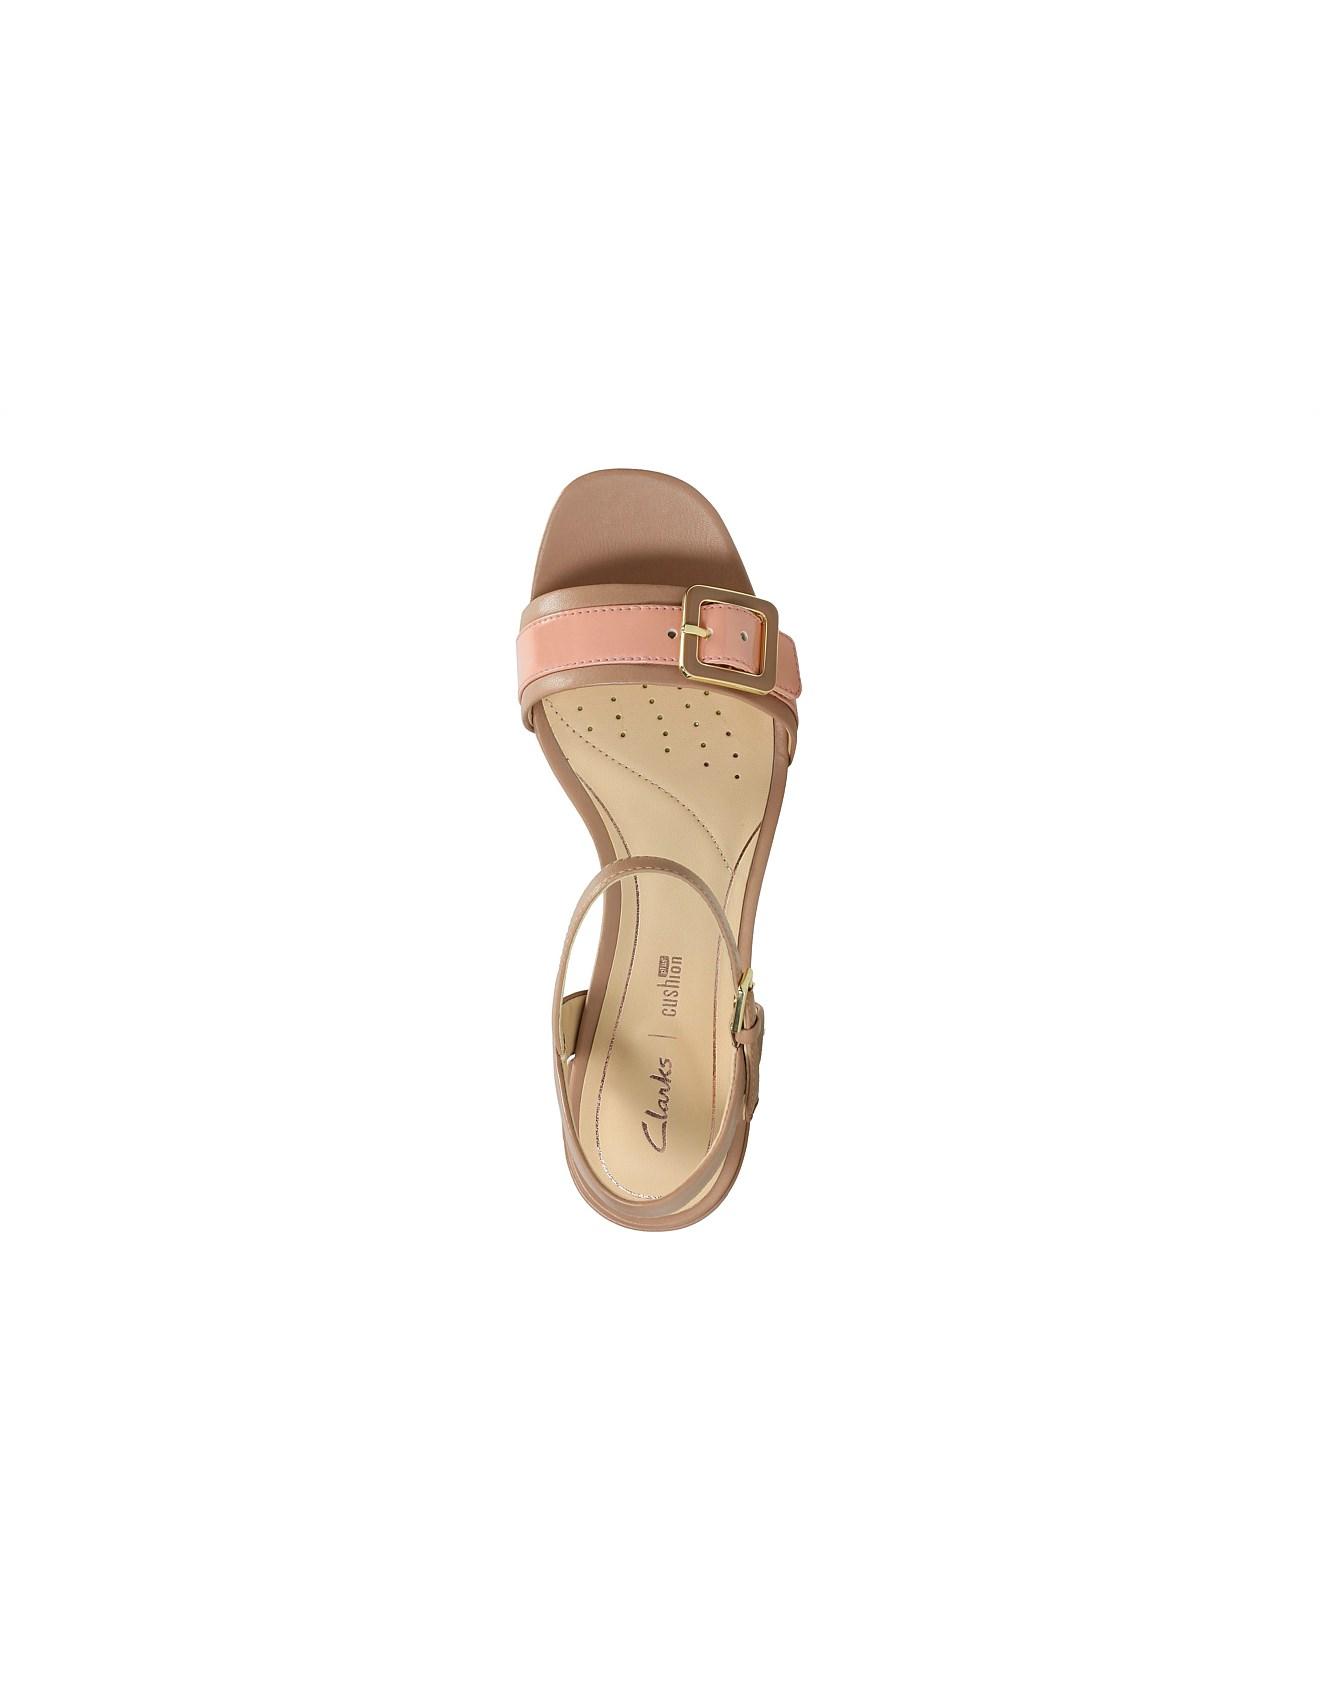 98adcb2984ca Shoes - ORABELLA SHINE